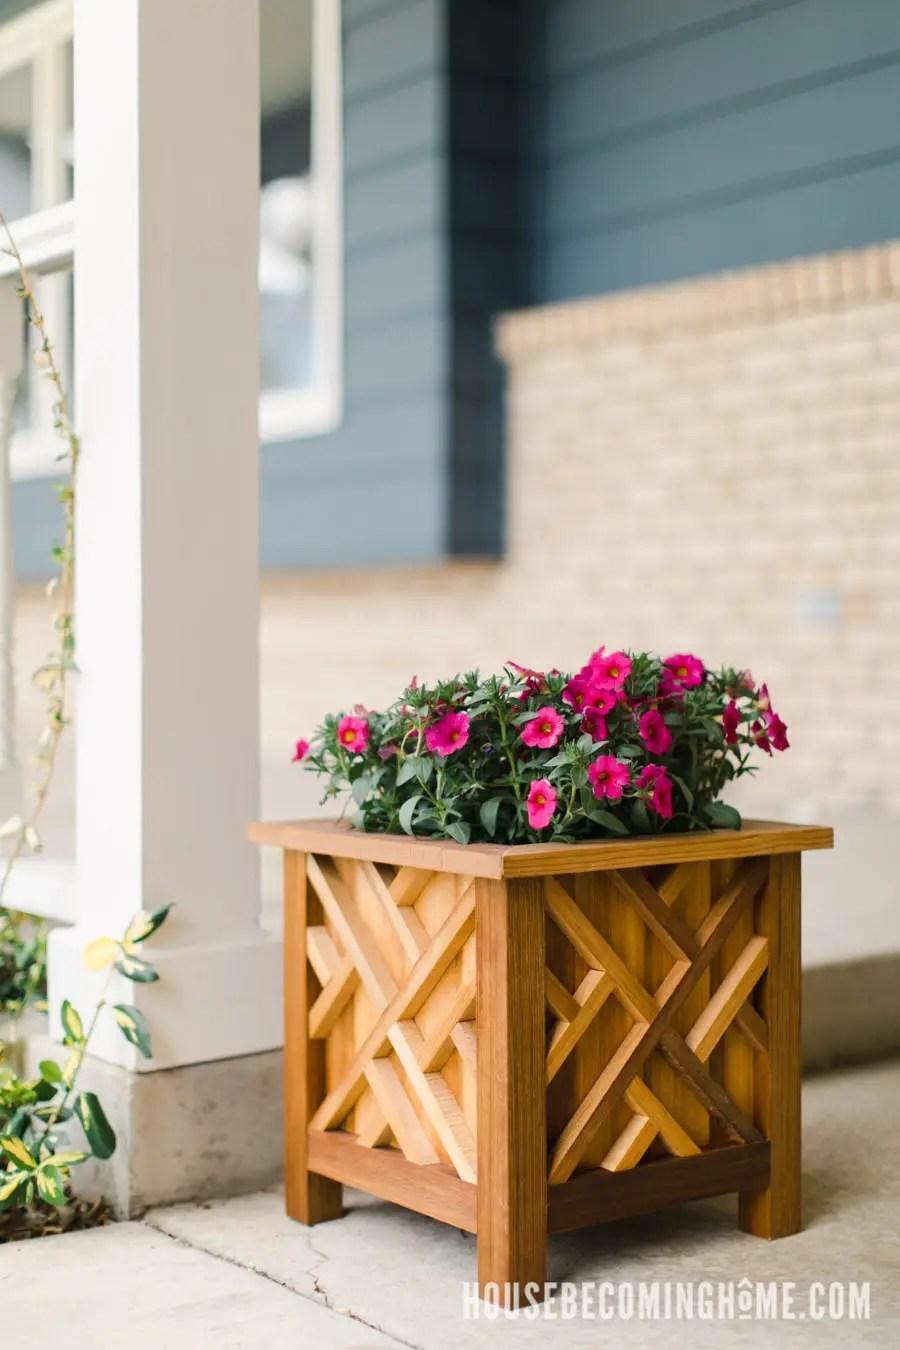 Cedar Planter DIY Plans